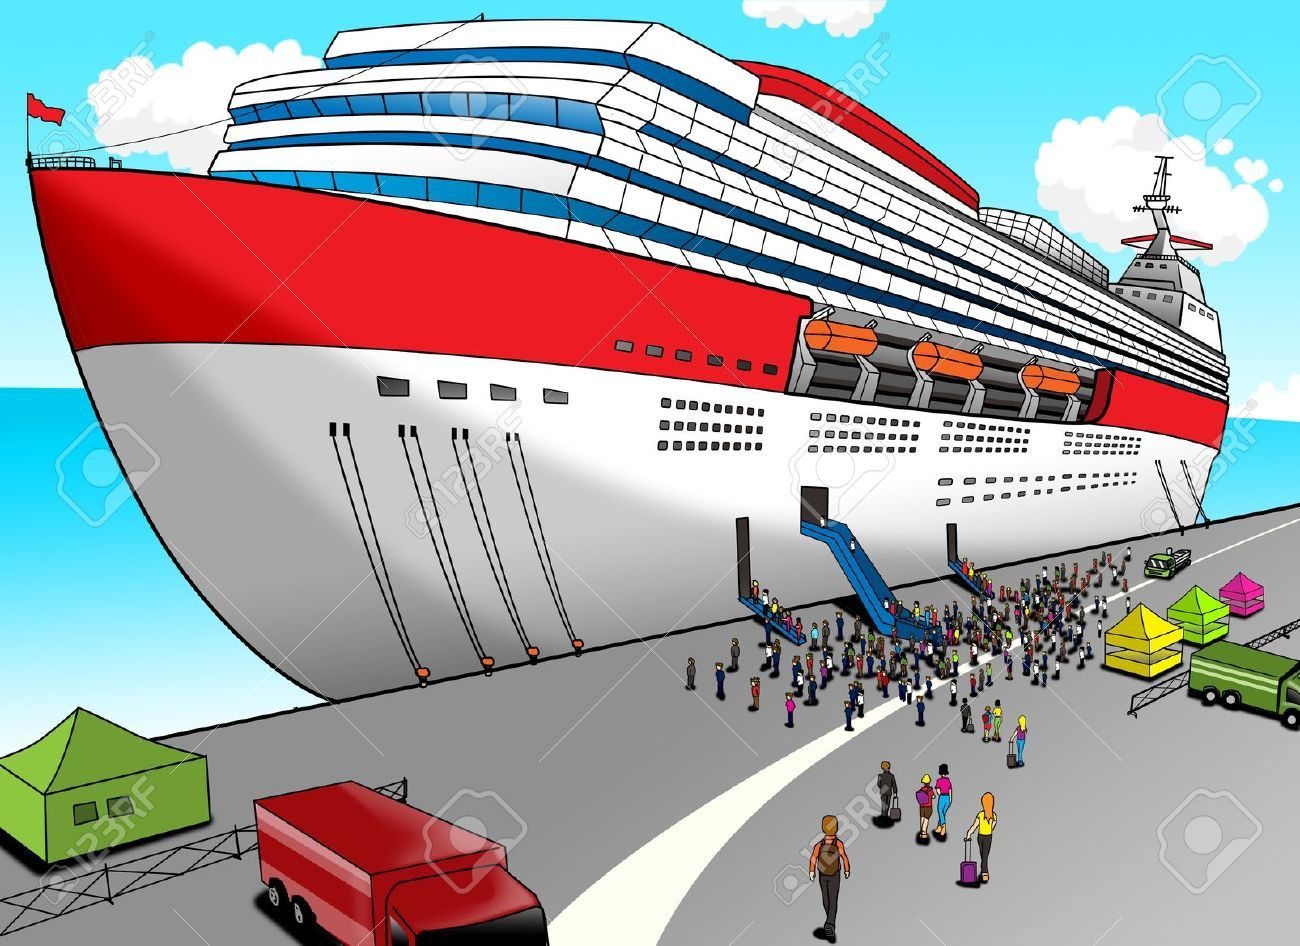 13462474-Cartoon-illustration-of-a-cruise-ship-Stock-Illustration.jpg (1300u00d7946) | Cartoons Two ...